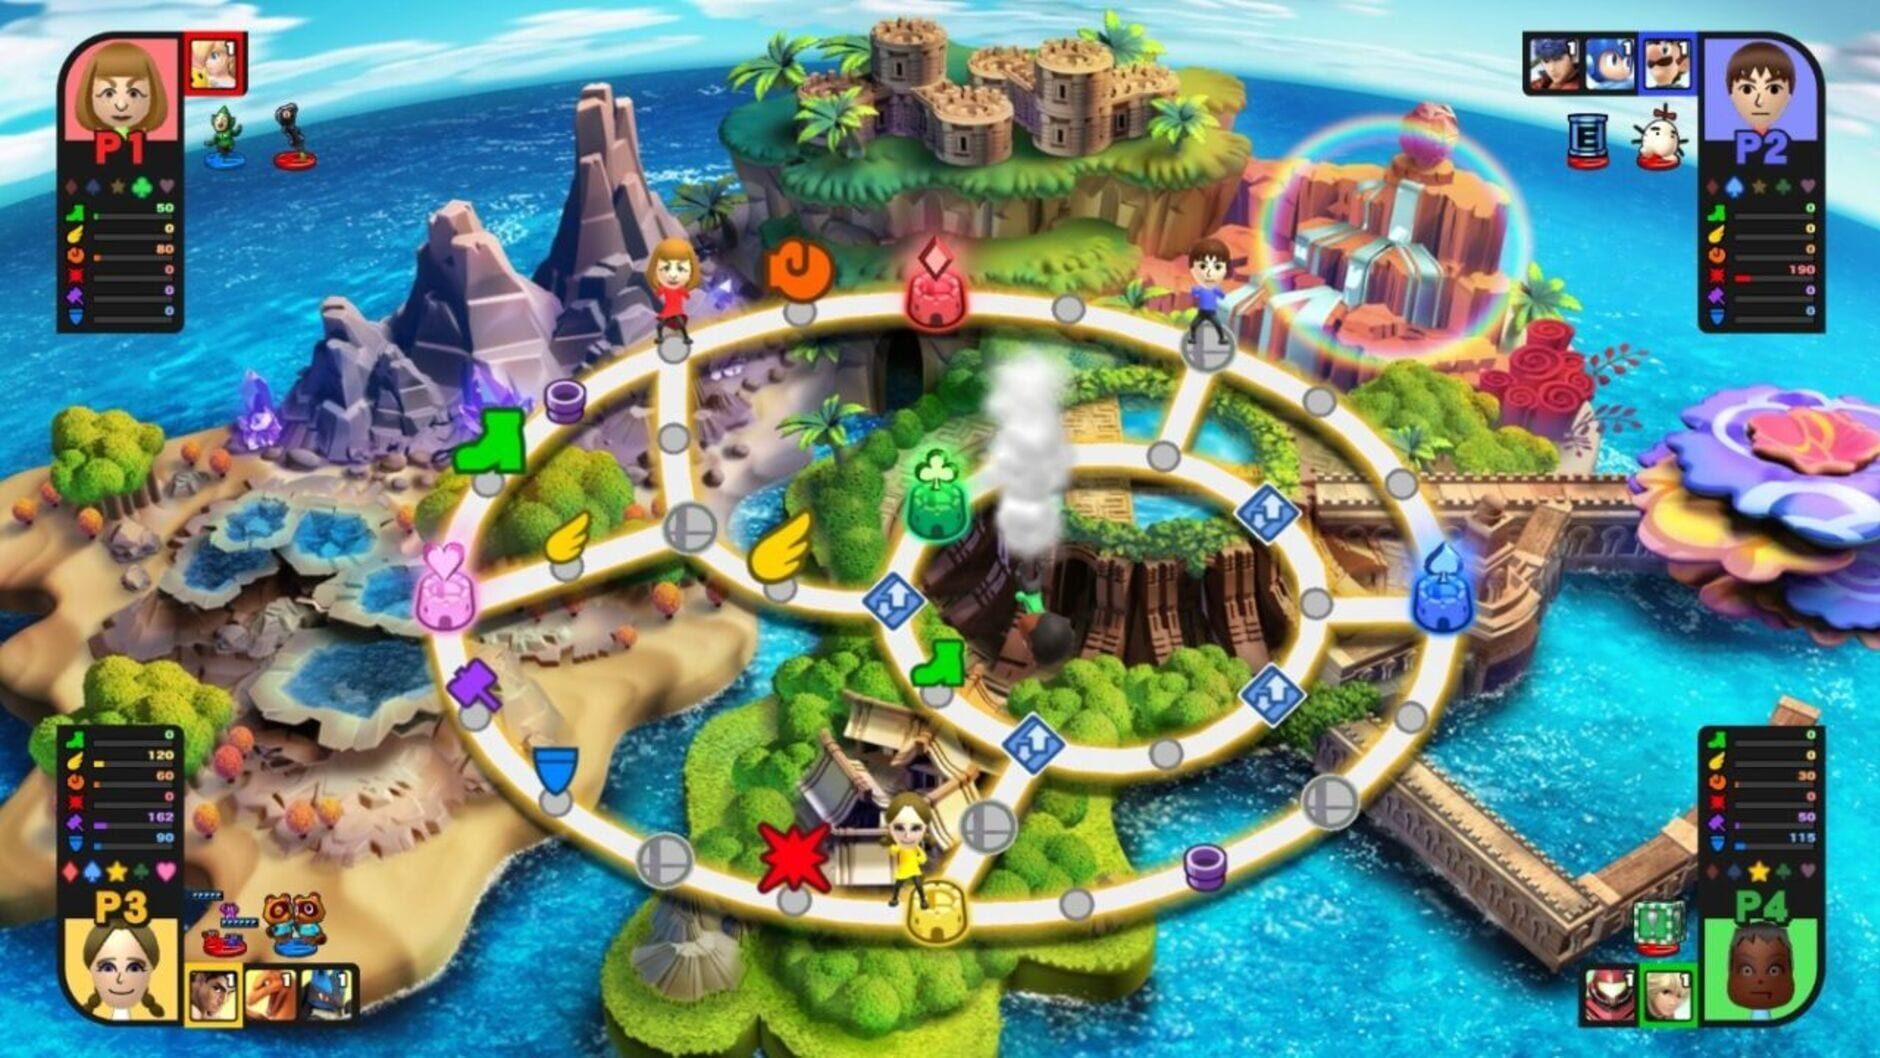 Super Smash Bros. for Wii U - 1